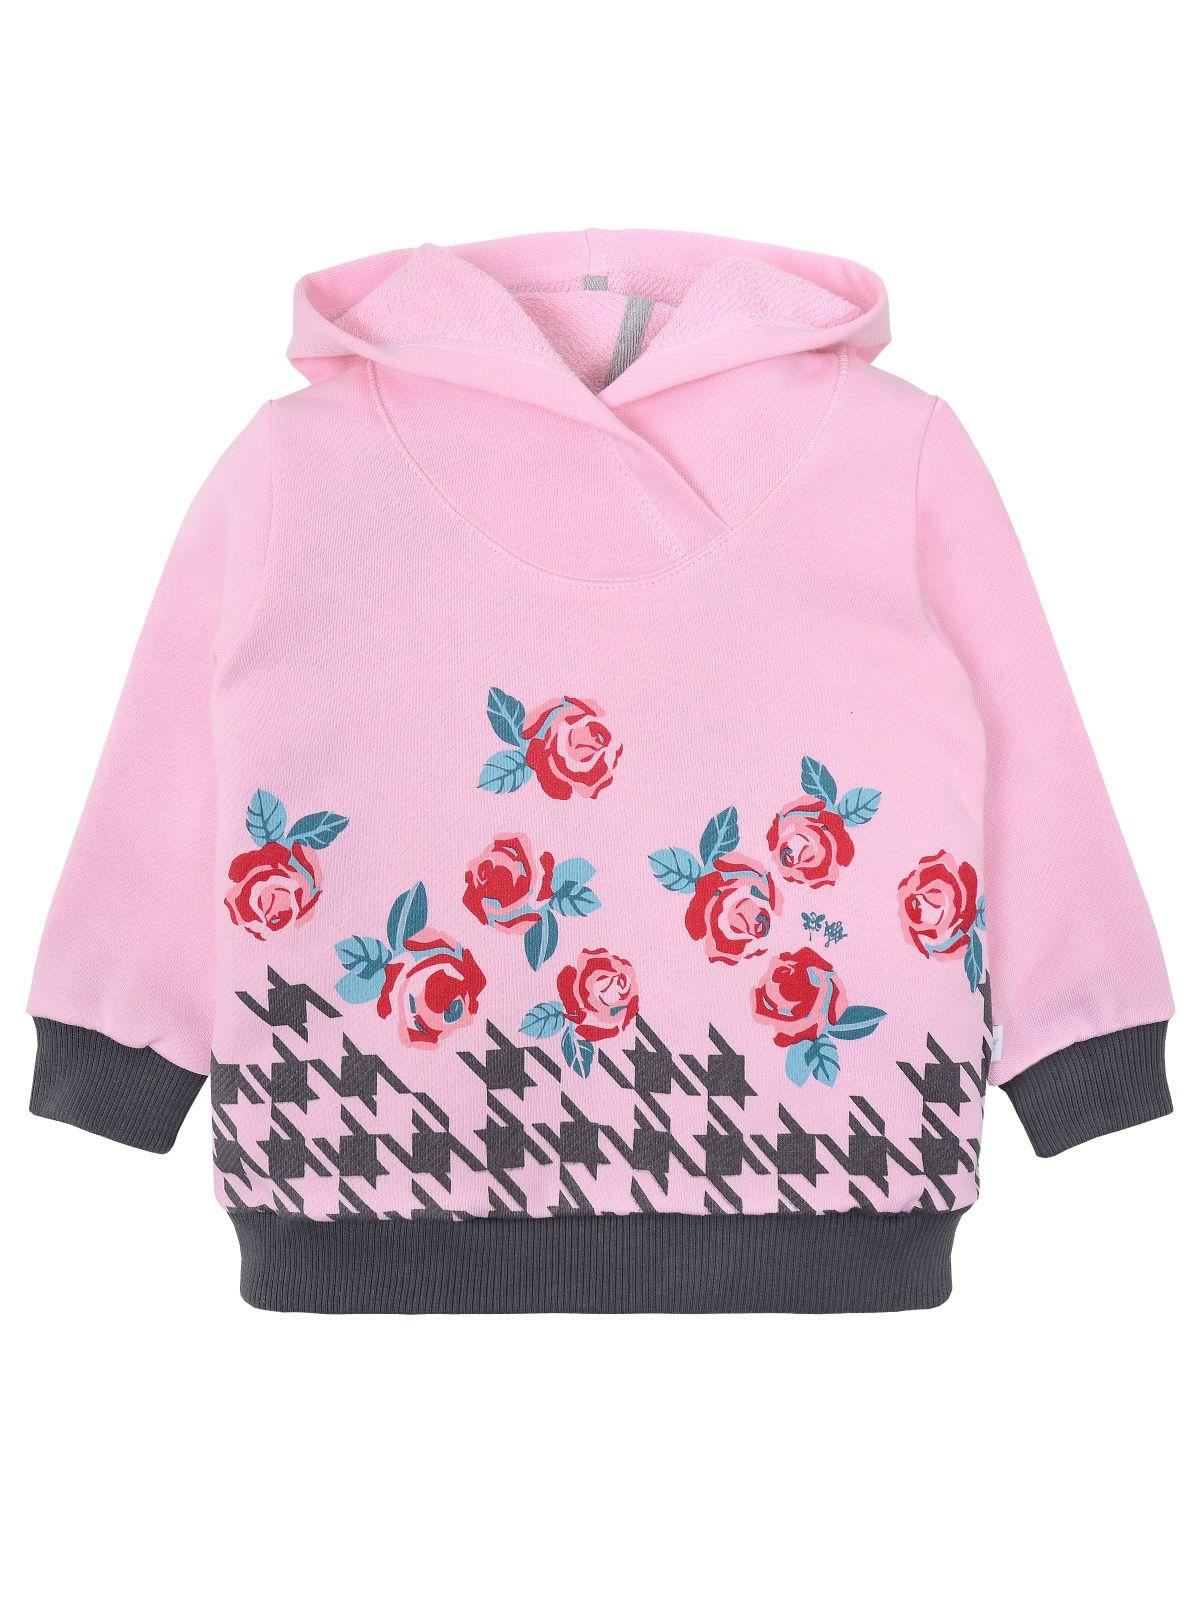 Джемпер для девочки Мамуляндия 19-826 Футер, Розовый р.122